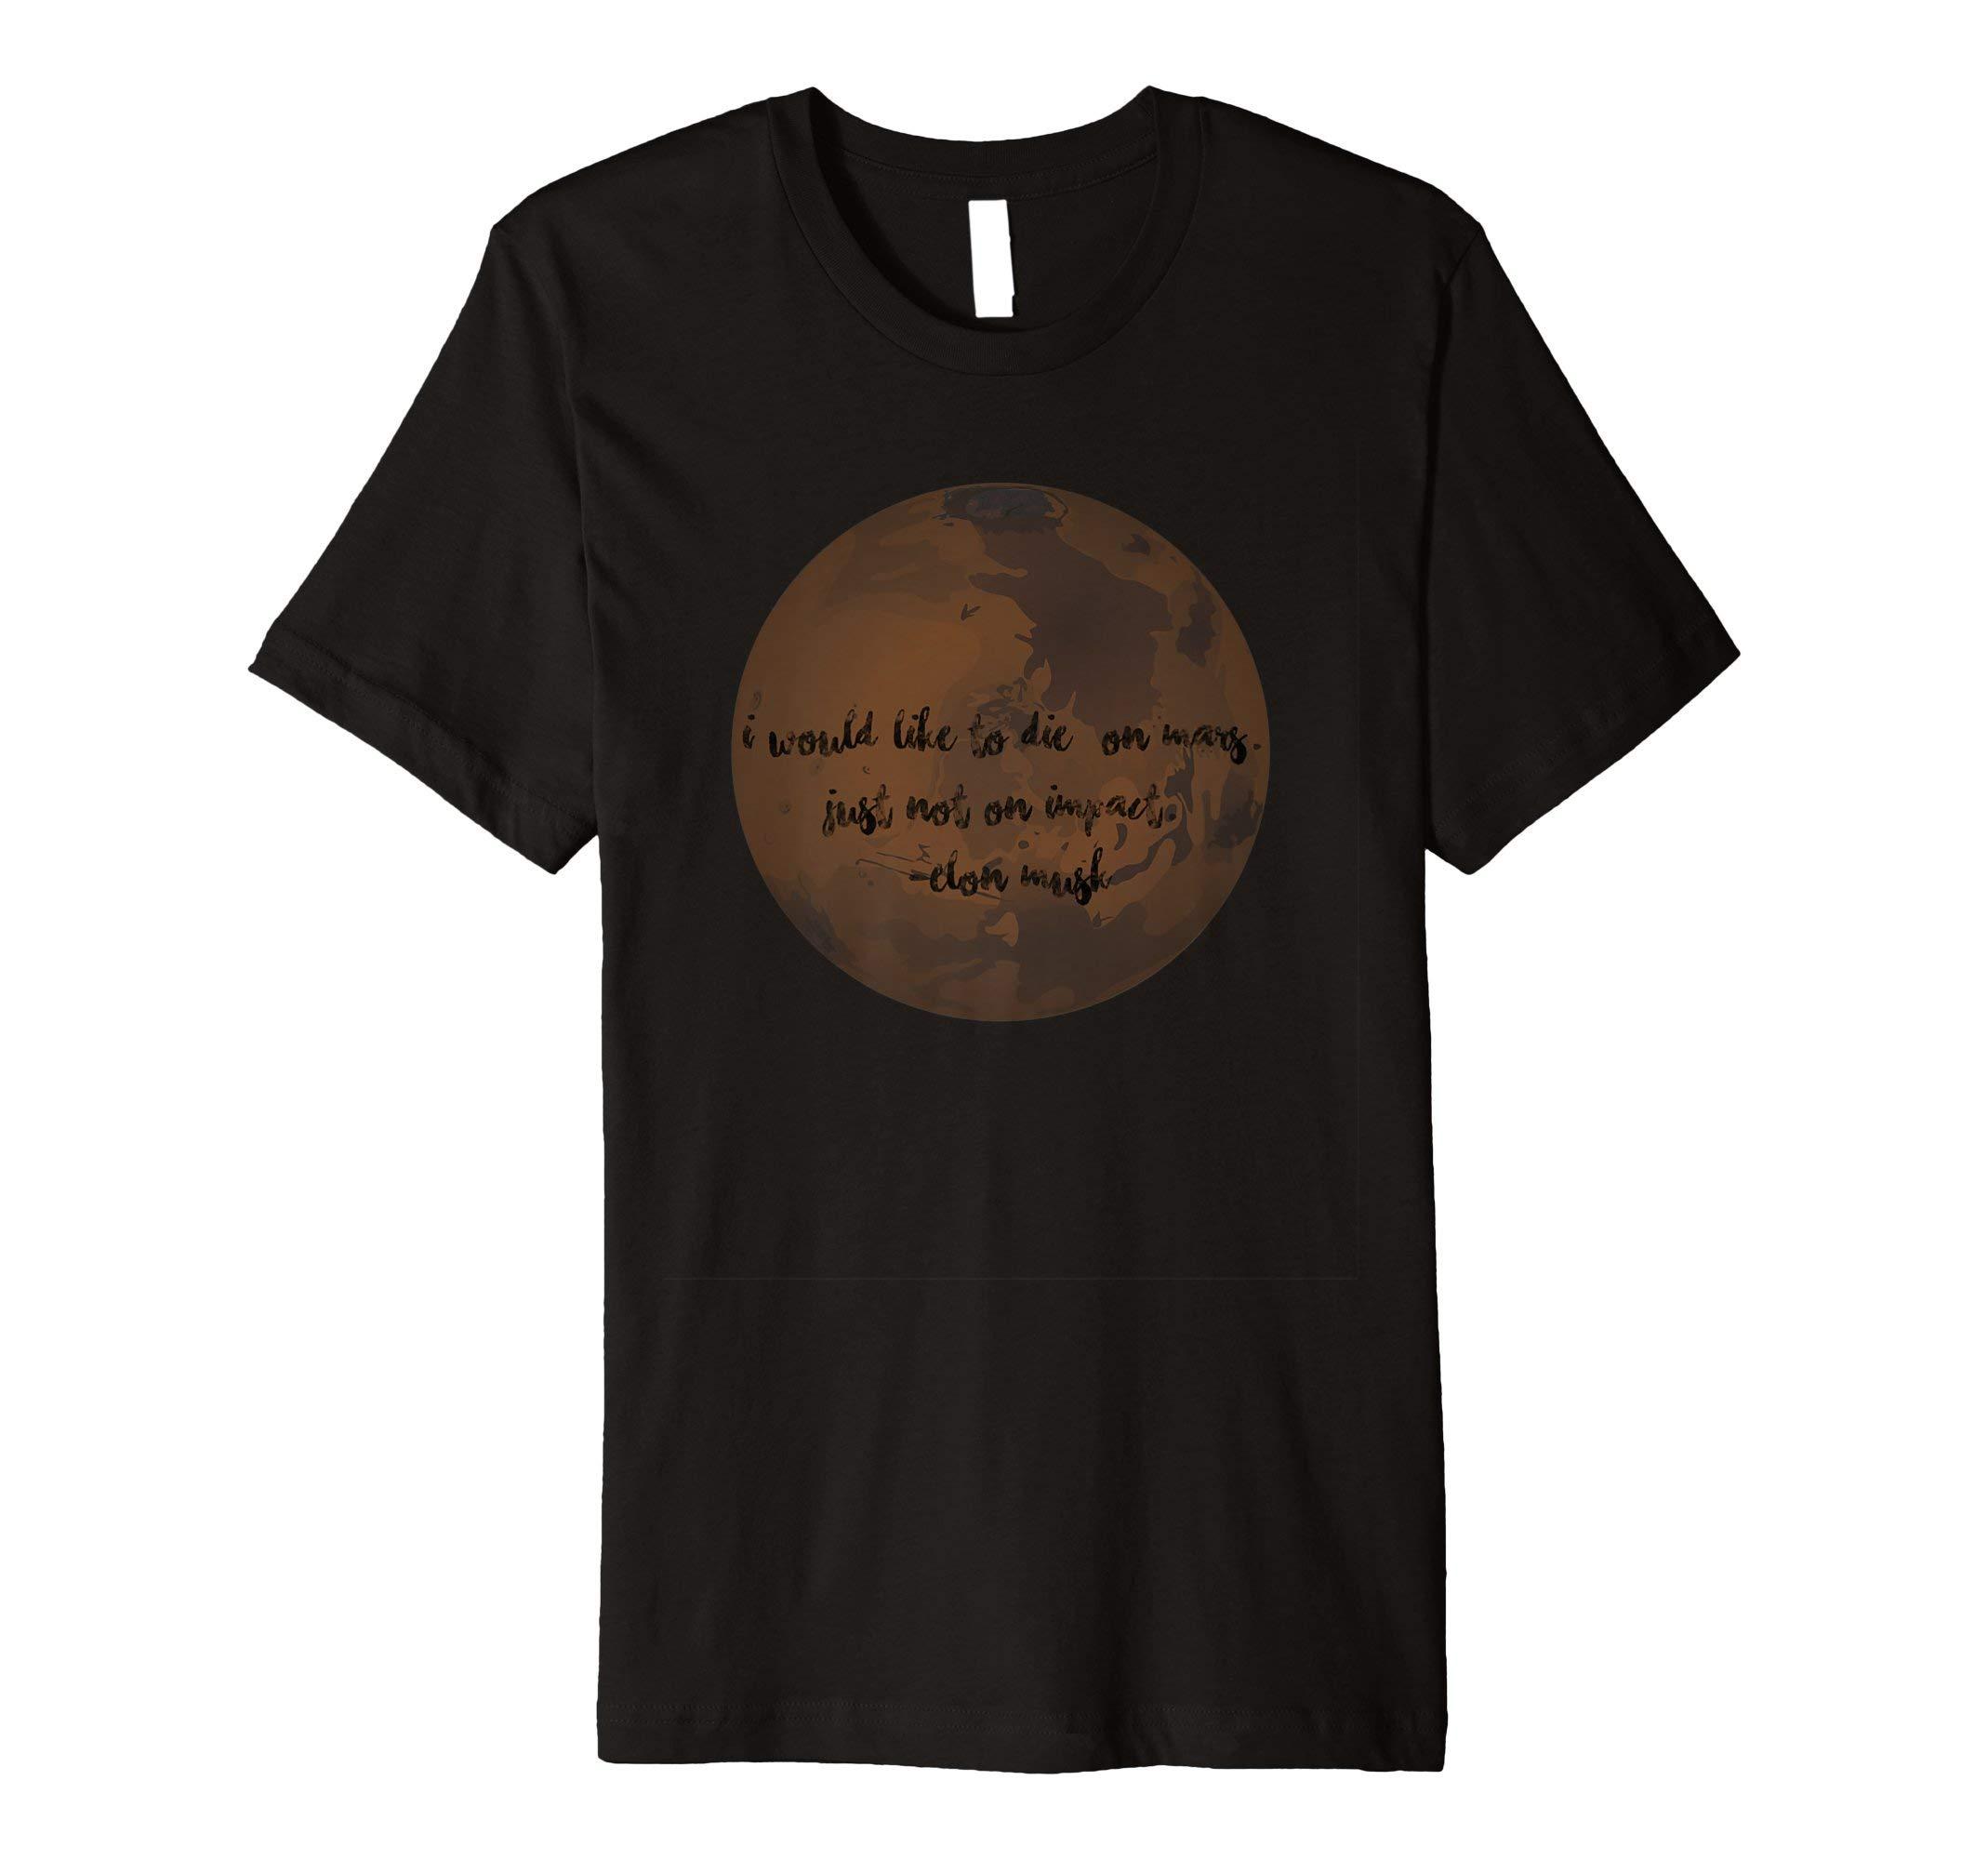 Lace Label Mars T-Shirt, Space Travel Shirt, Space Shirt